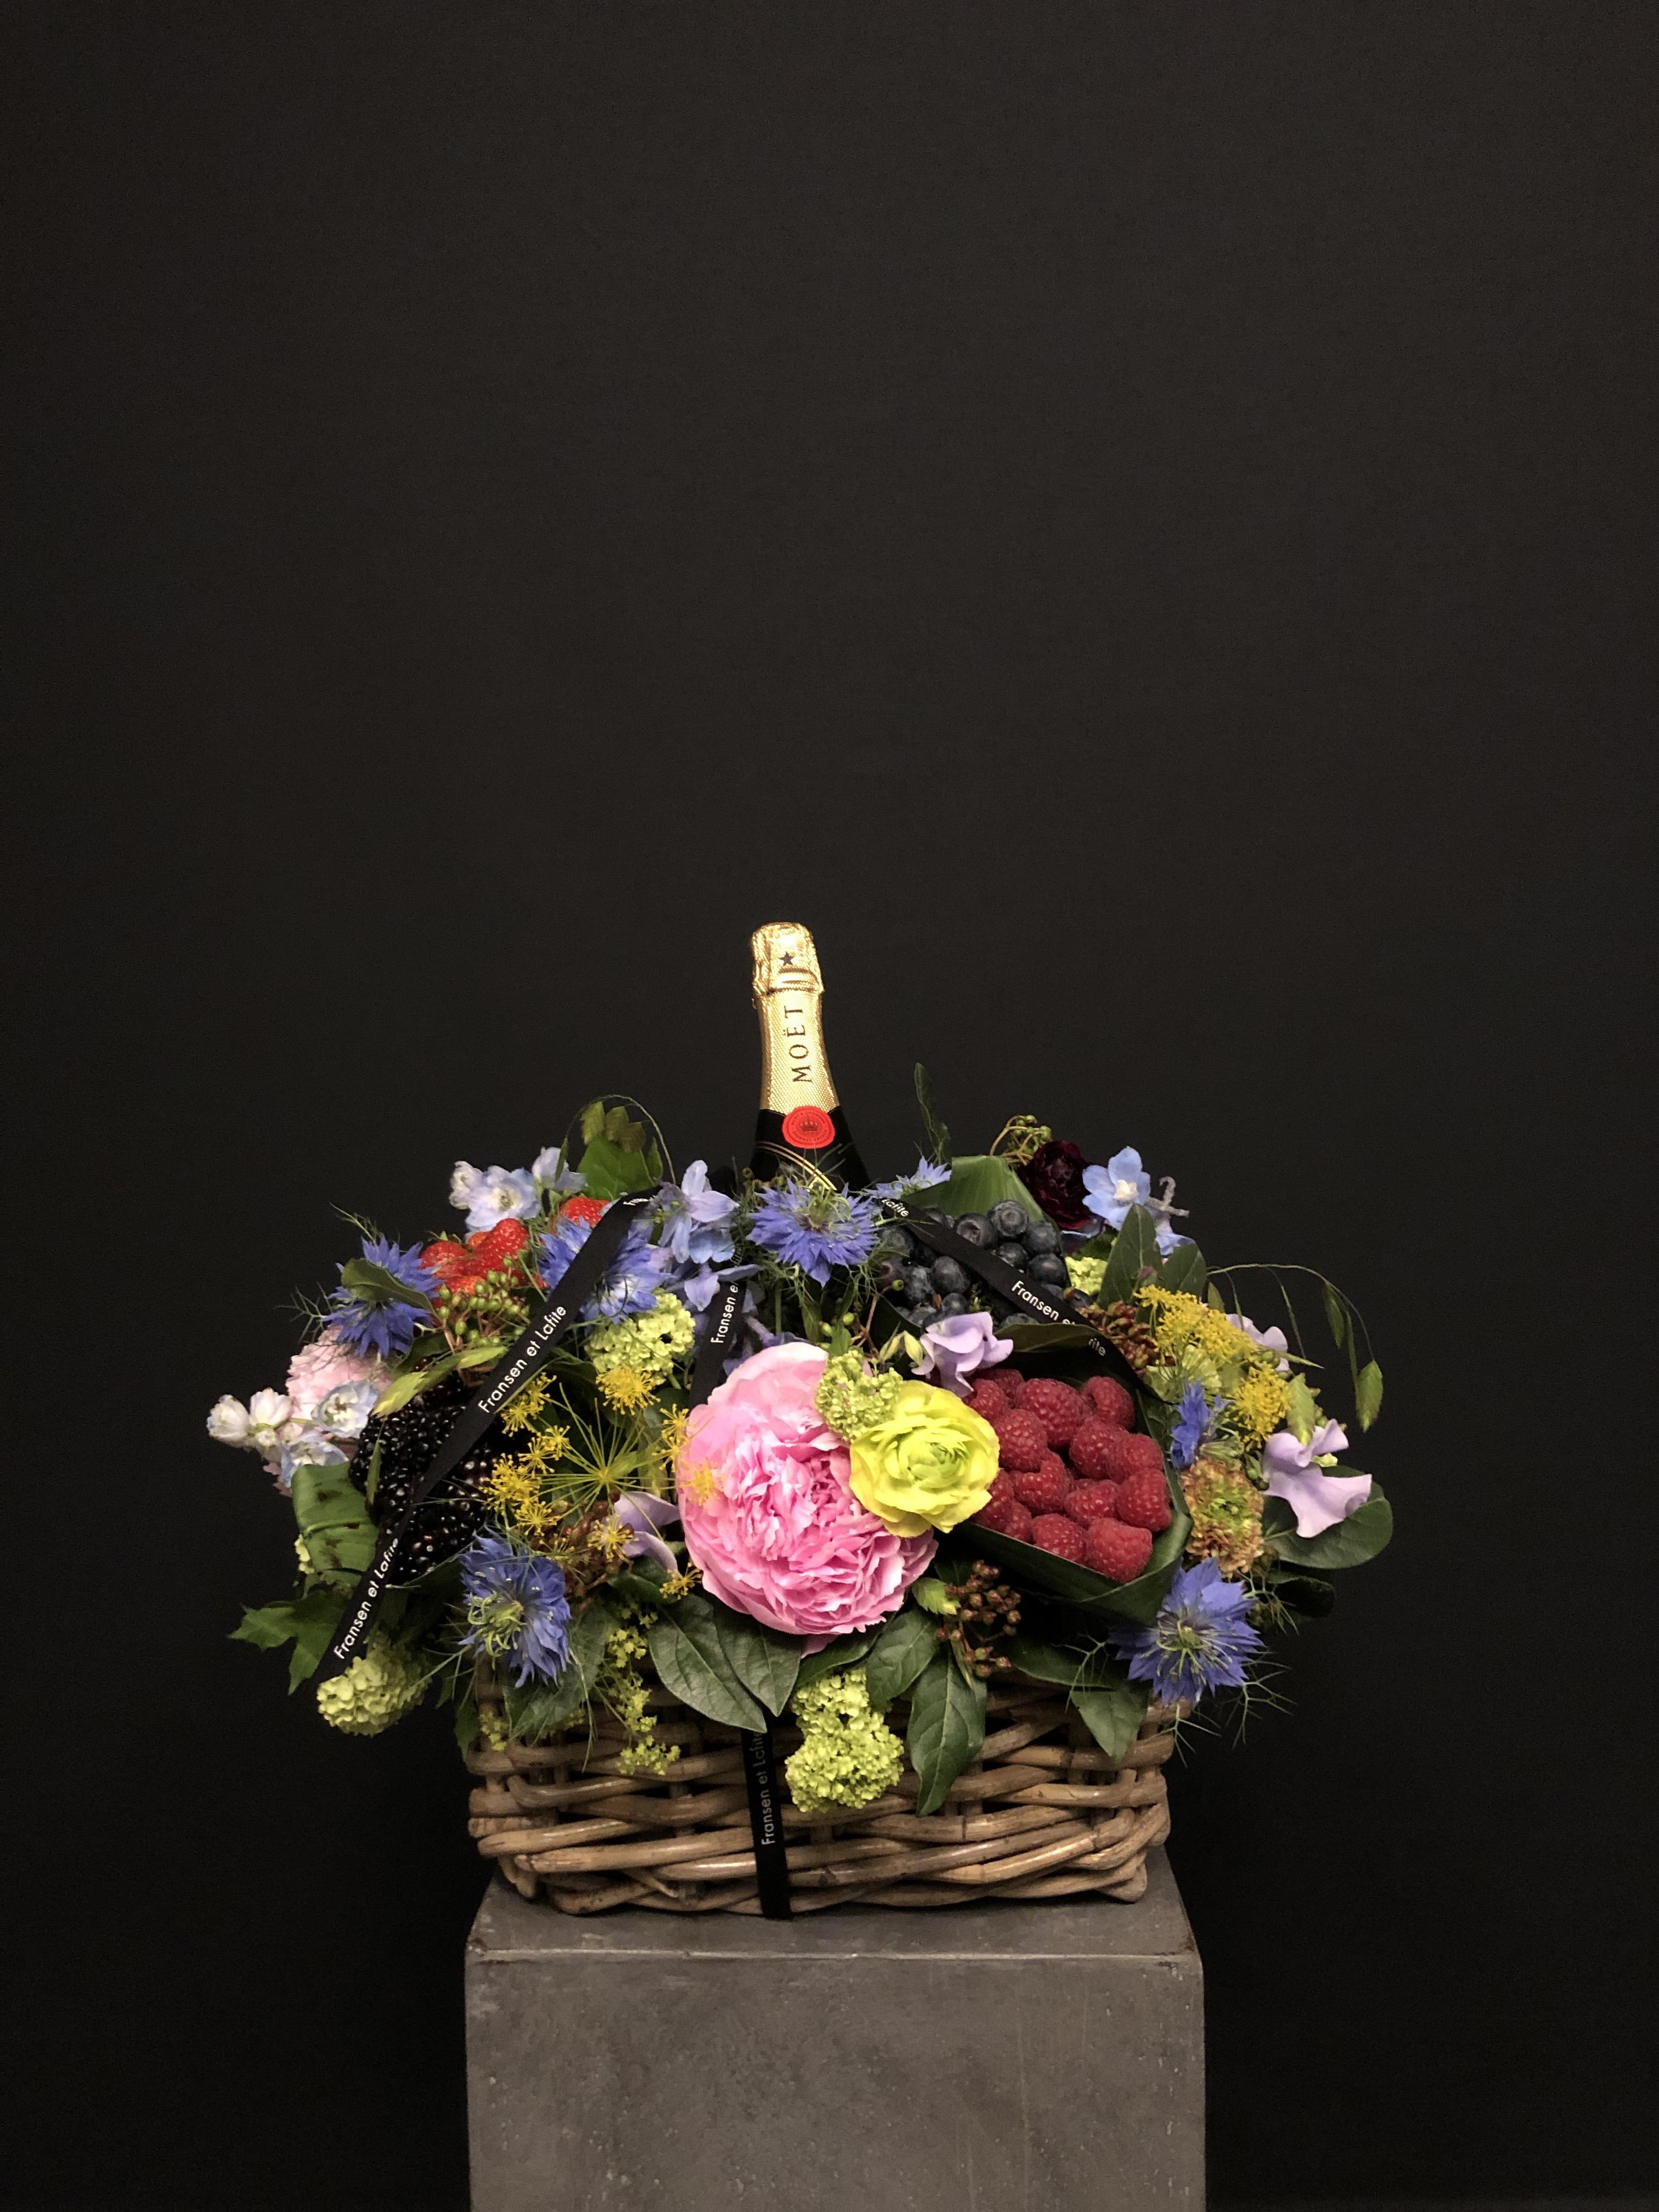 Cesta con flores, frutas y champagne Moët Chandon